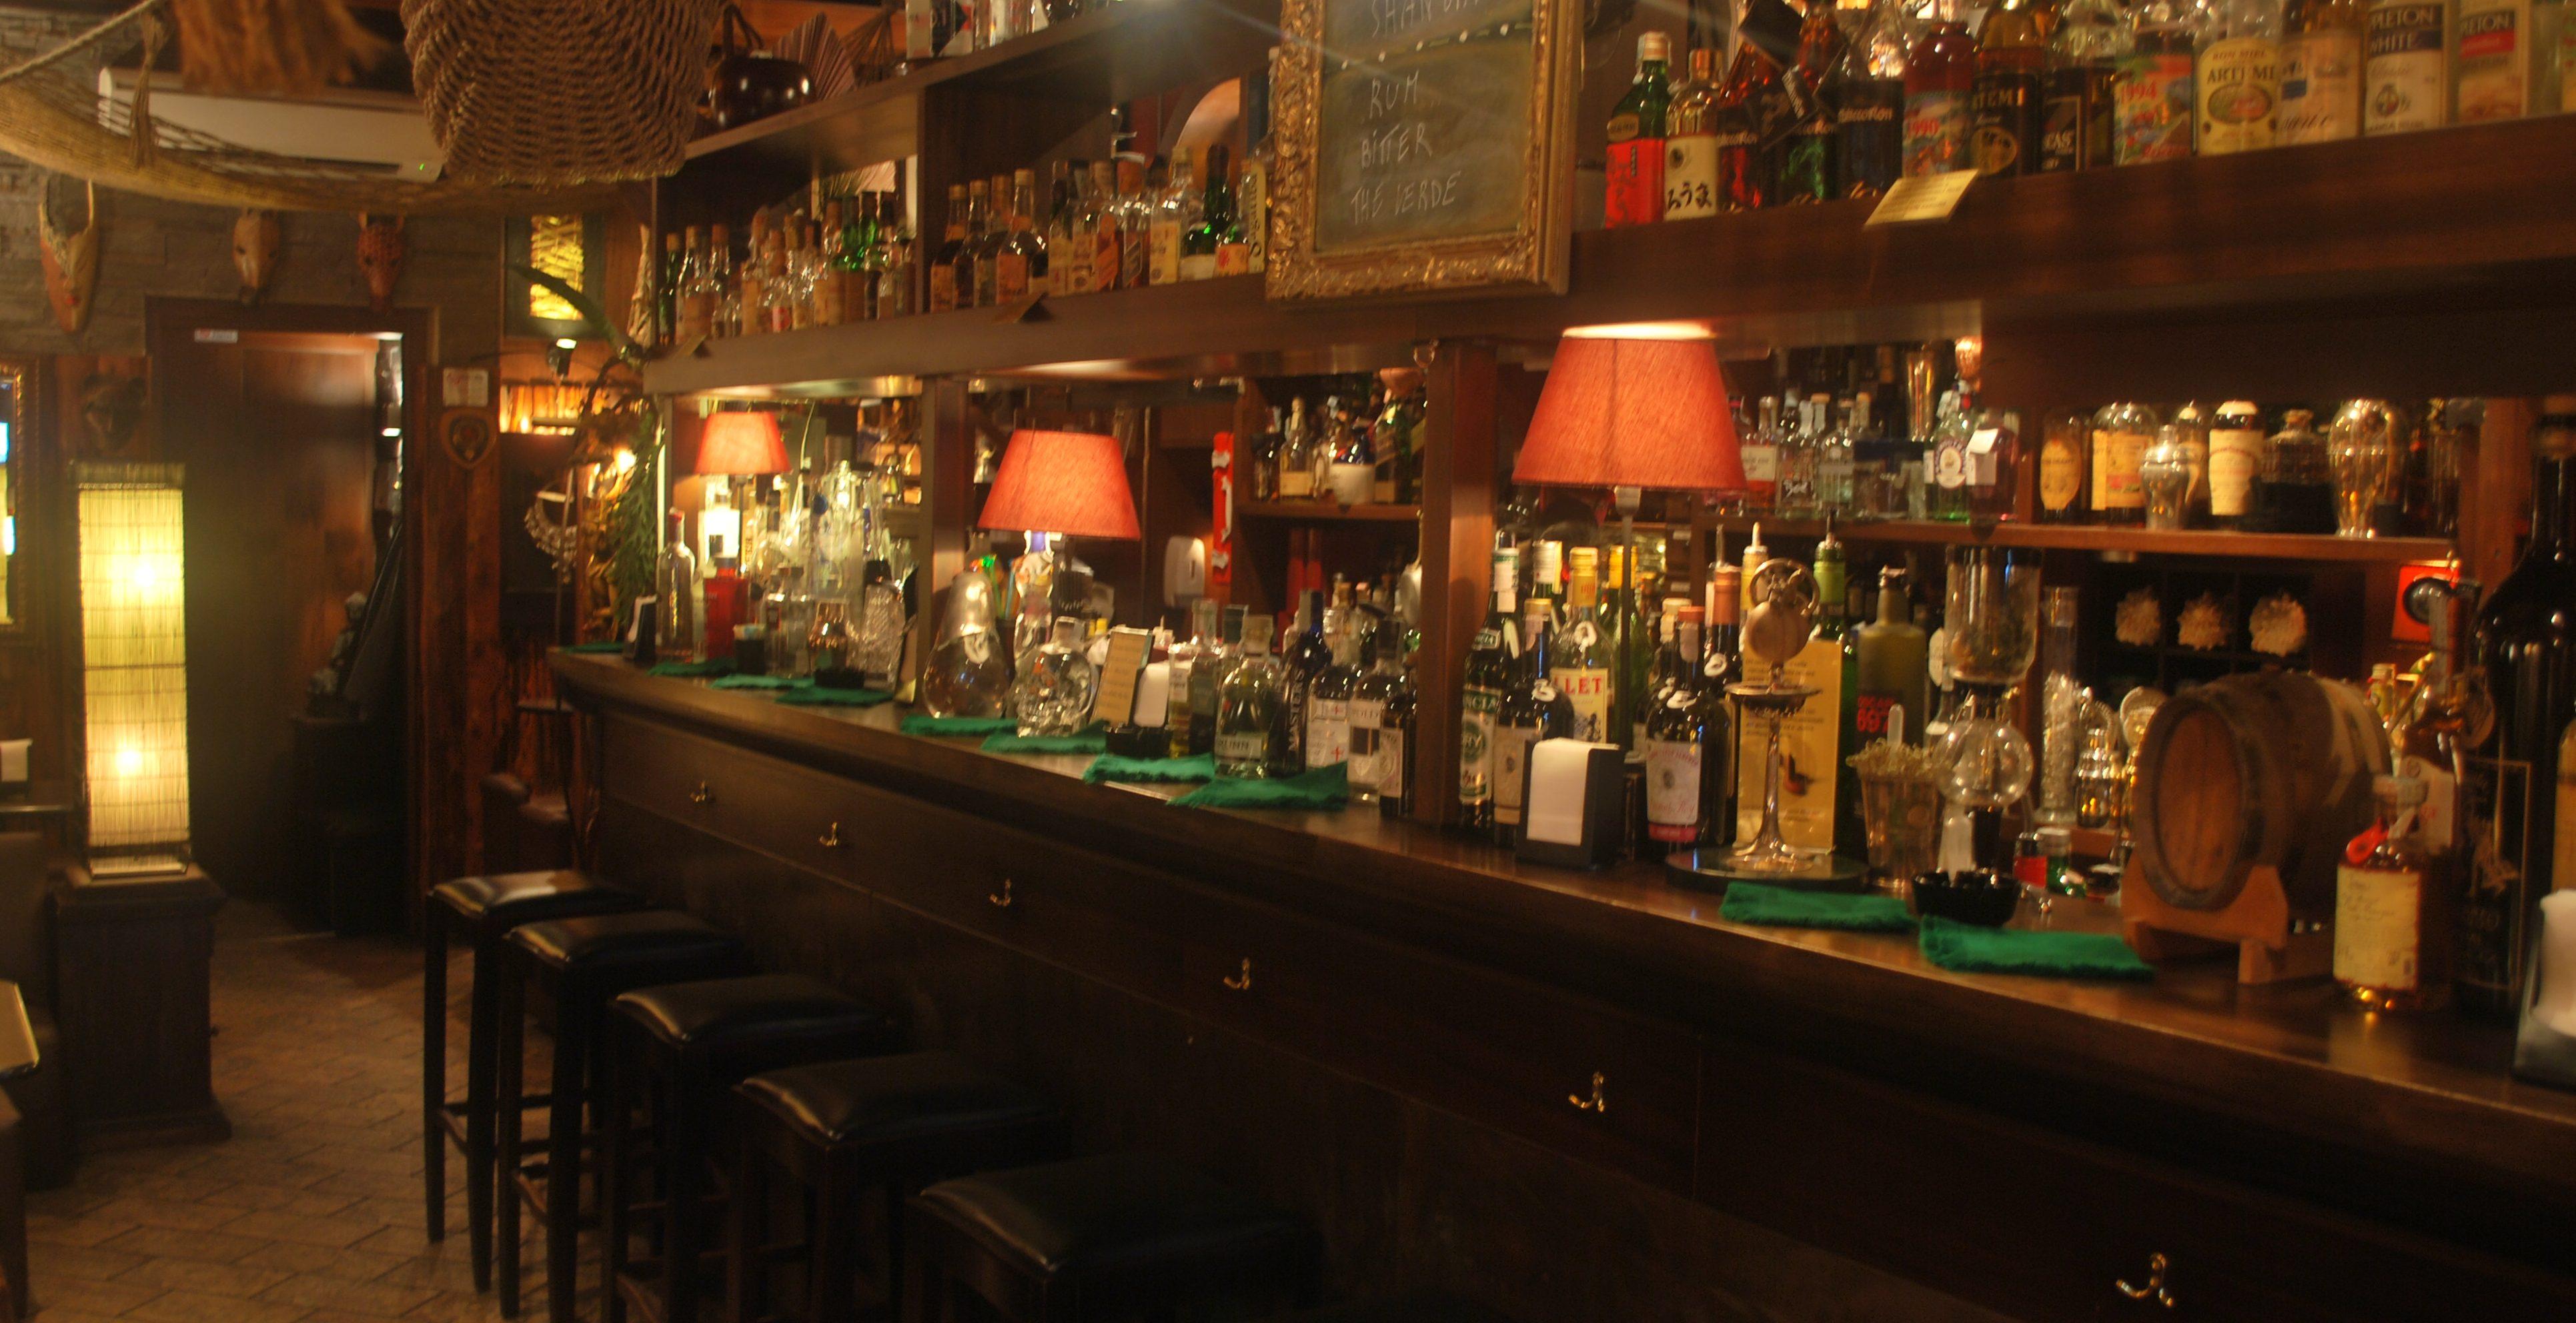 Notthingham Forest tra i migliori bar del mondo